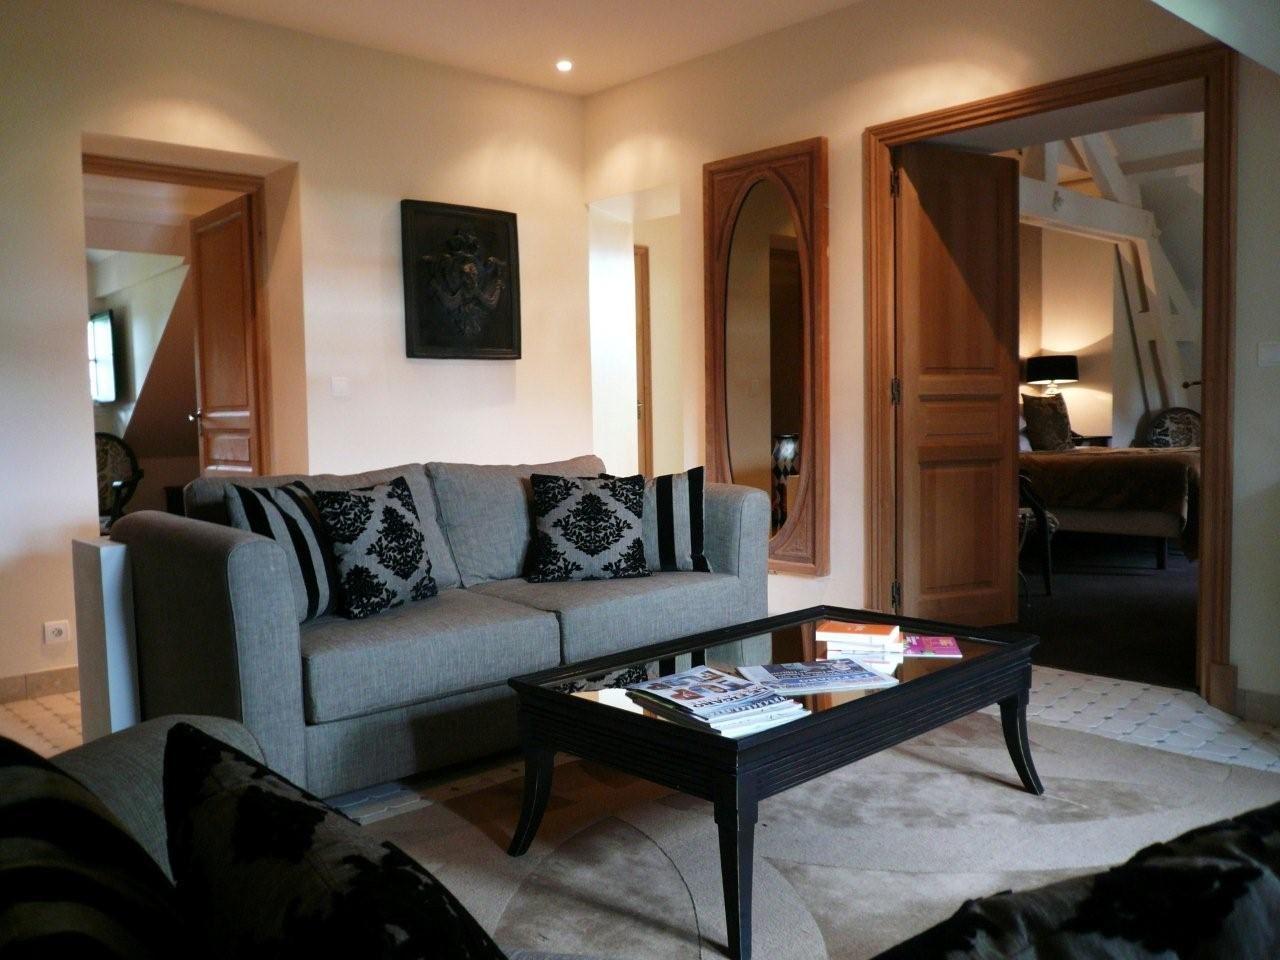 Beaumanoir - Small Luxury Boutique Hotel